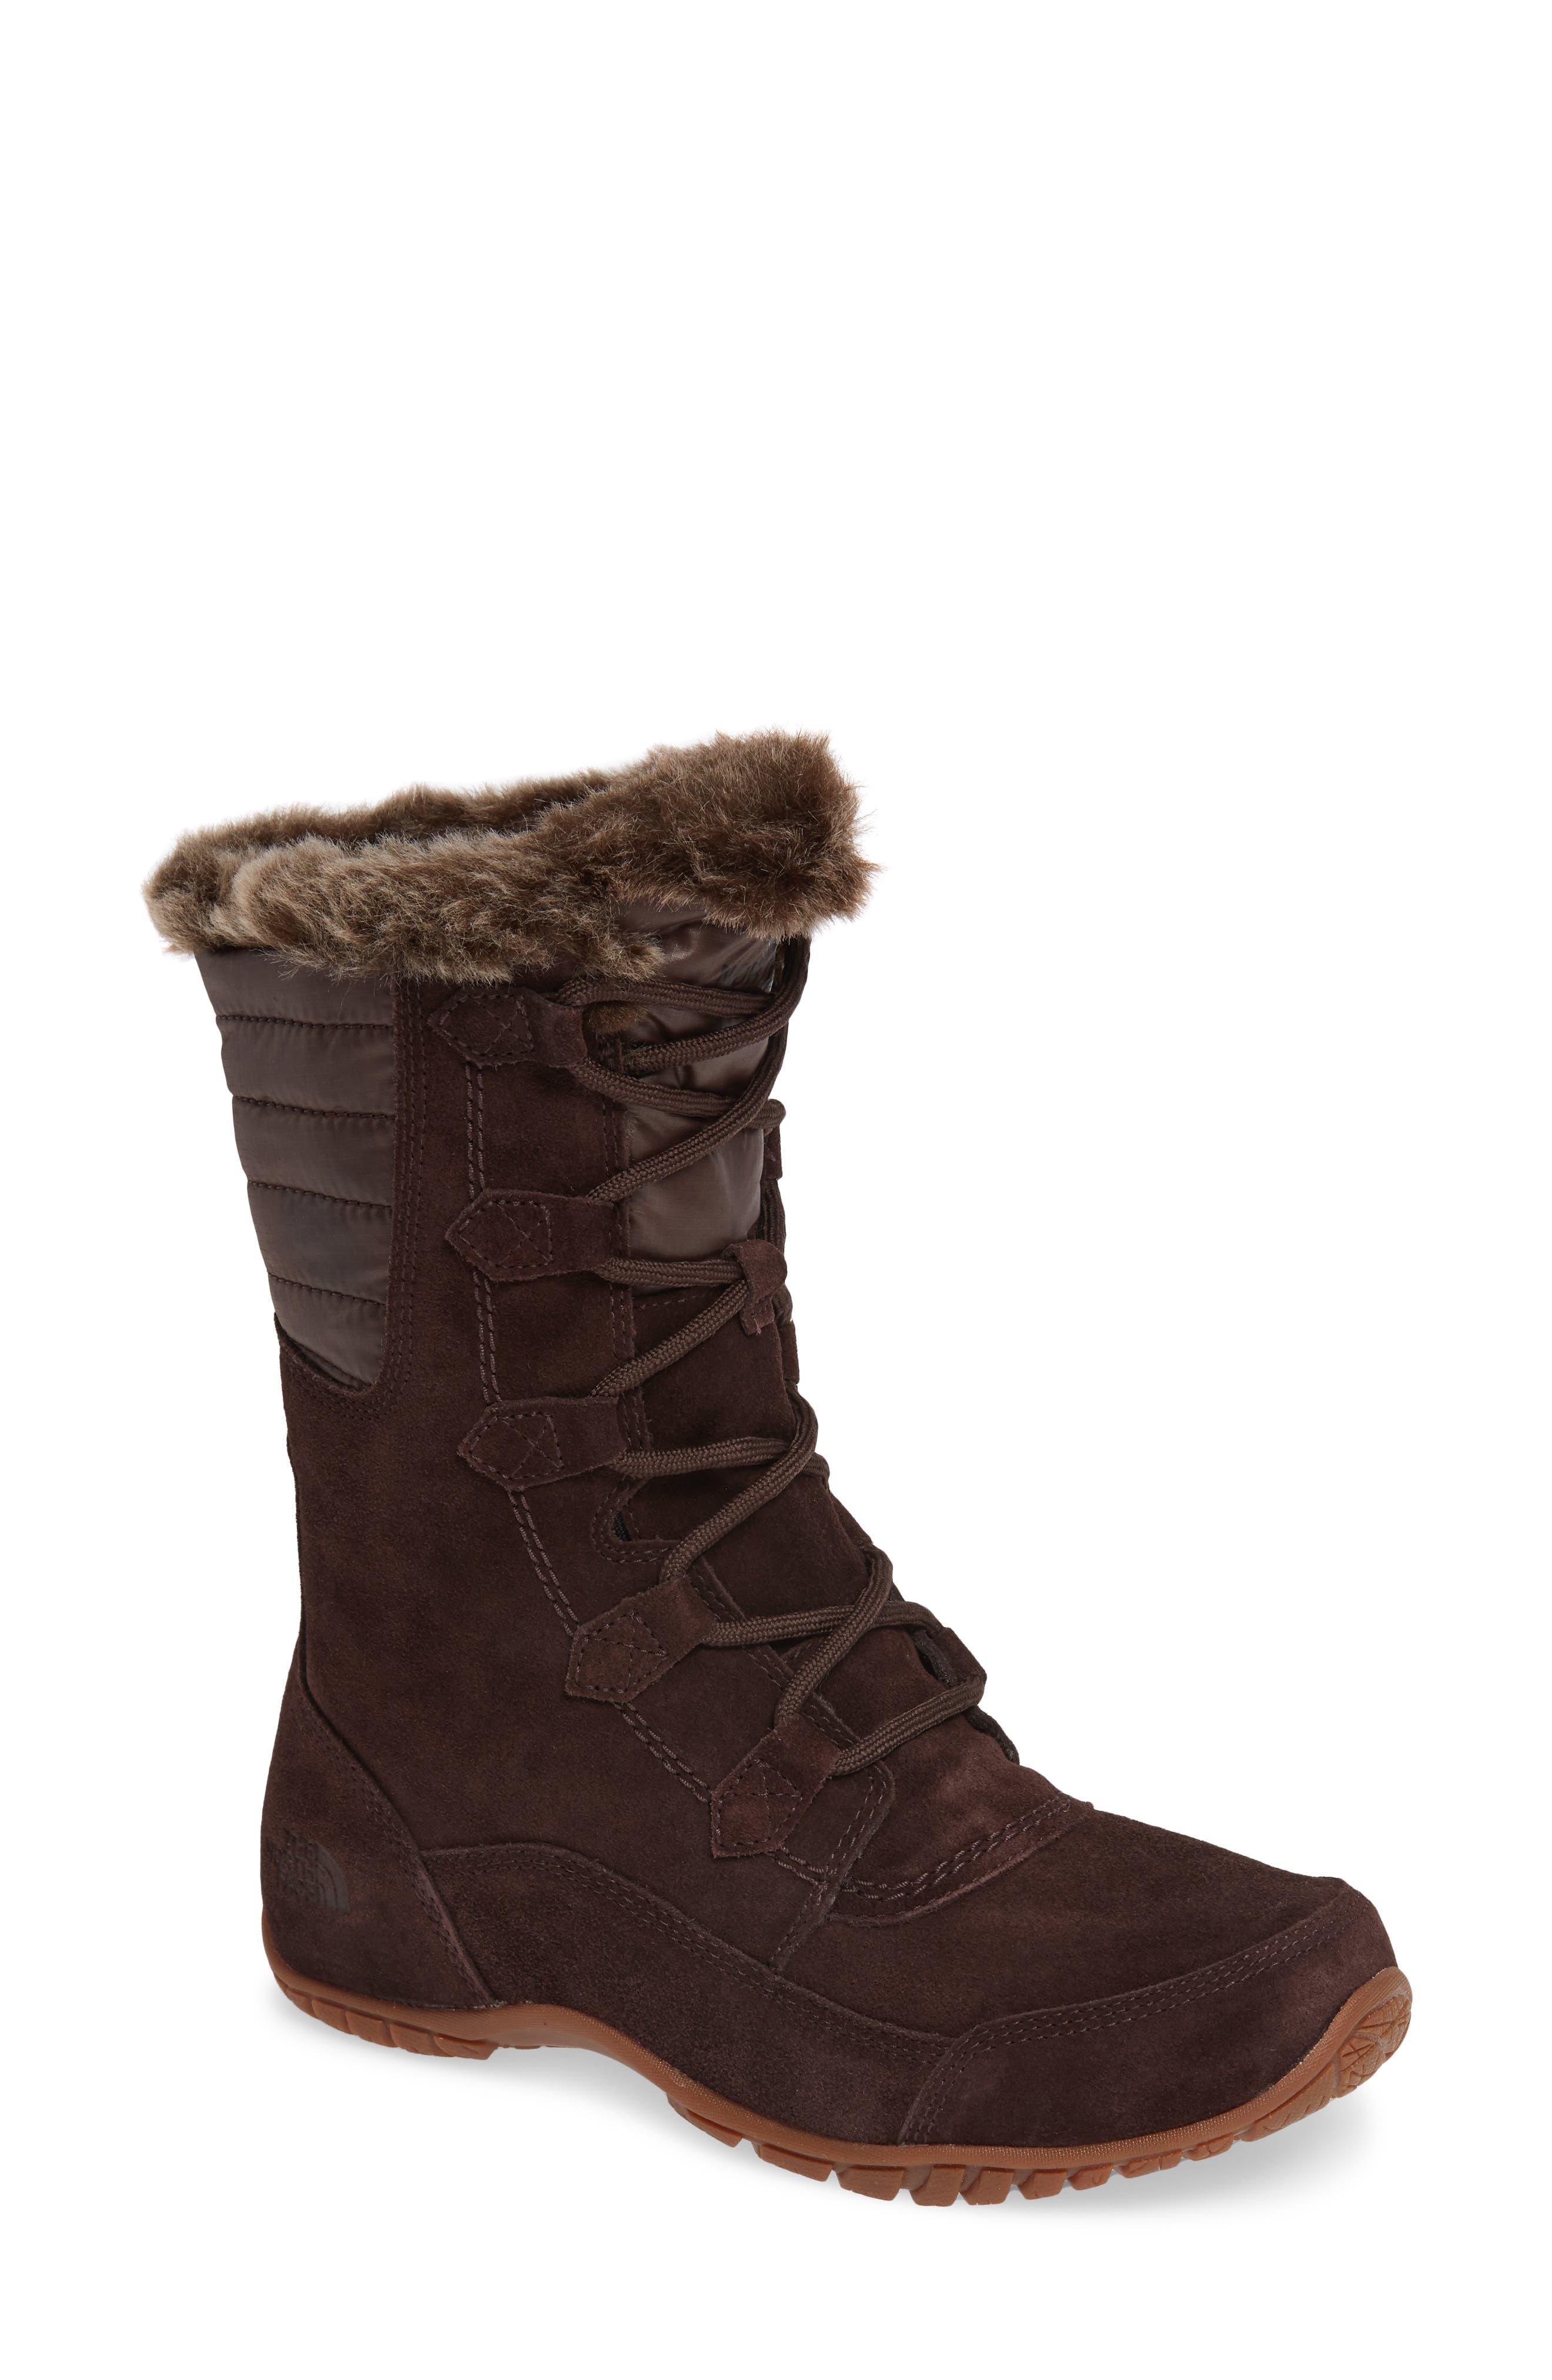 Nuptse Purna II Waterproof PrimaLoft<sup>®</sup> Silver Eco Insulated Winter Boot,                         Main,                         color, 201